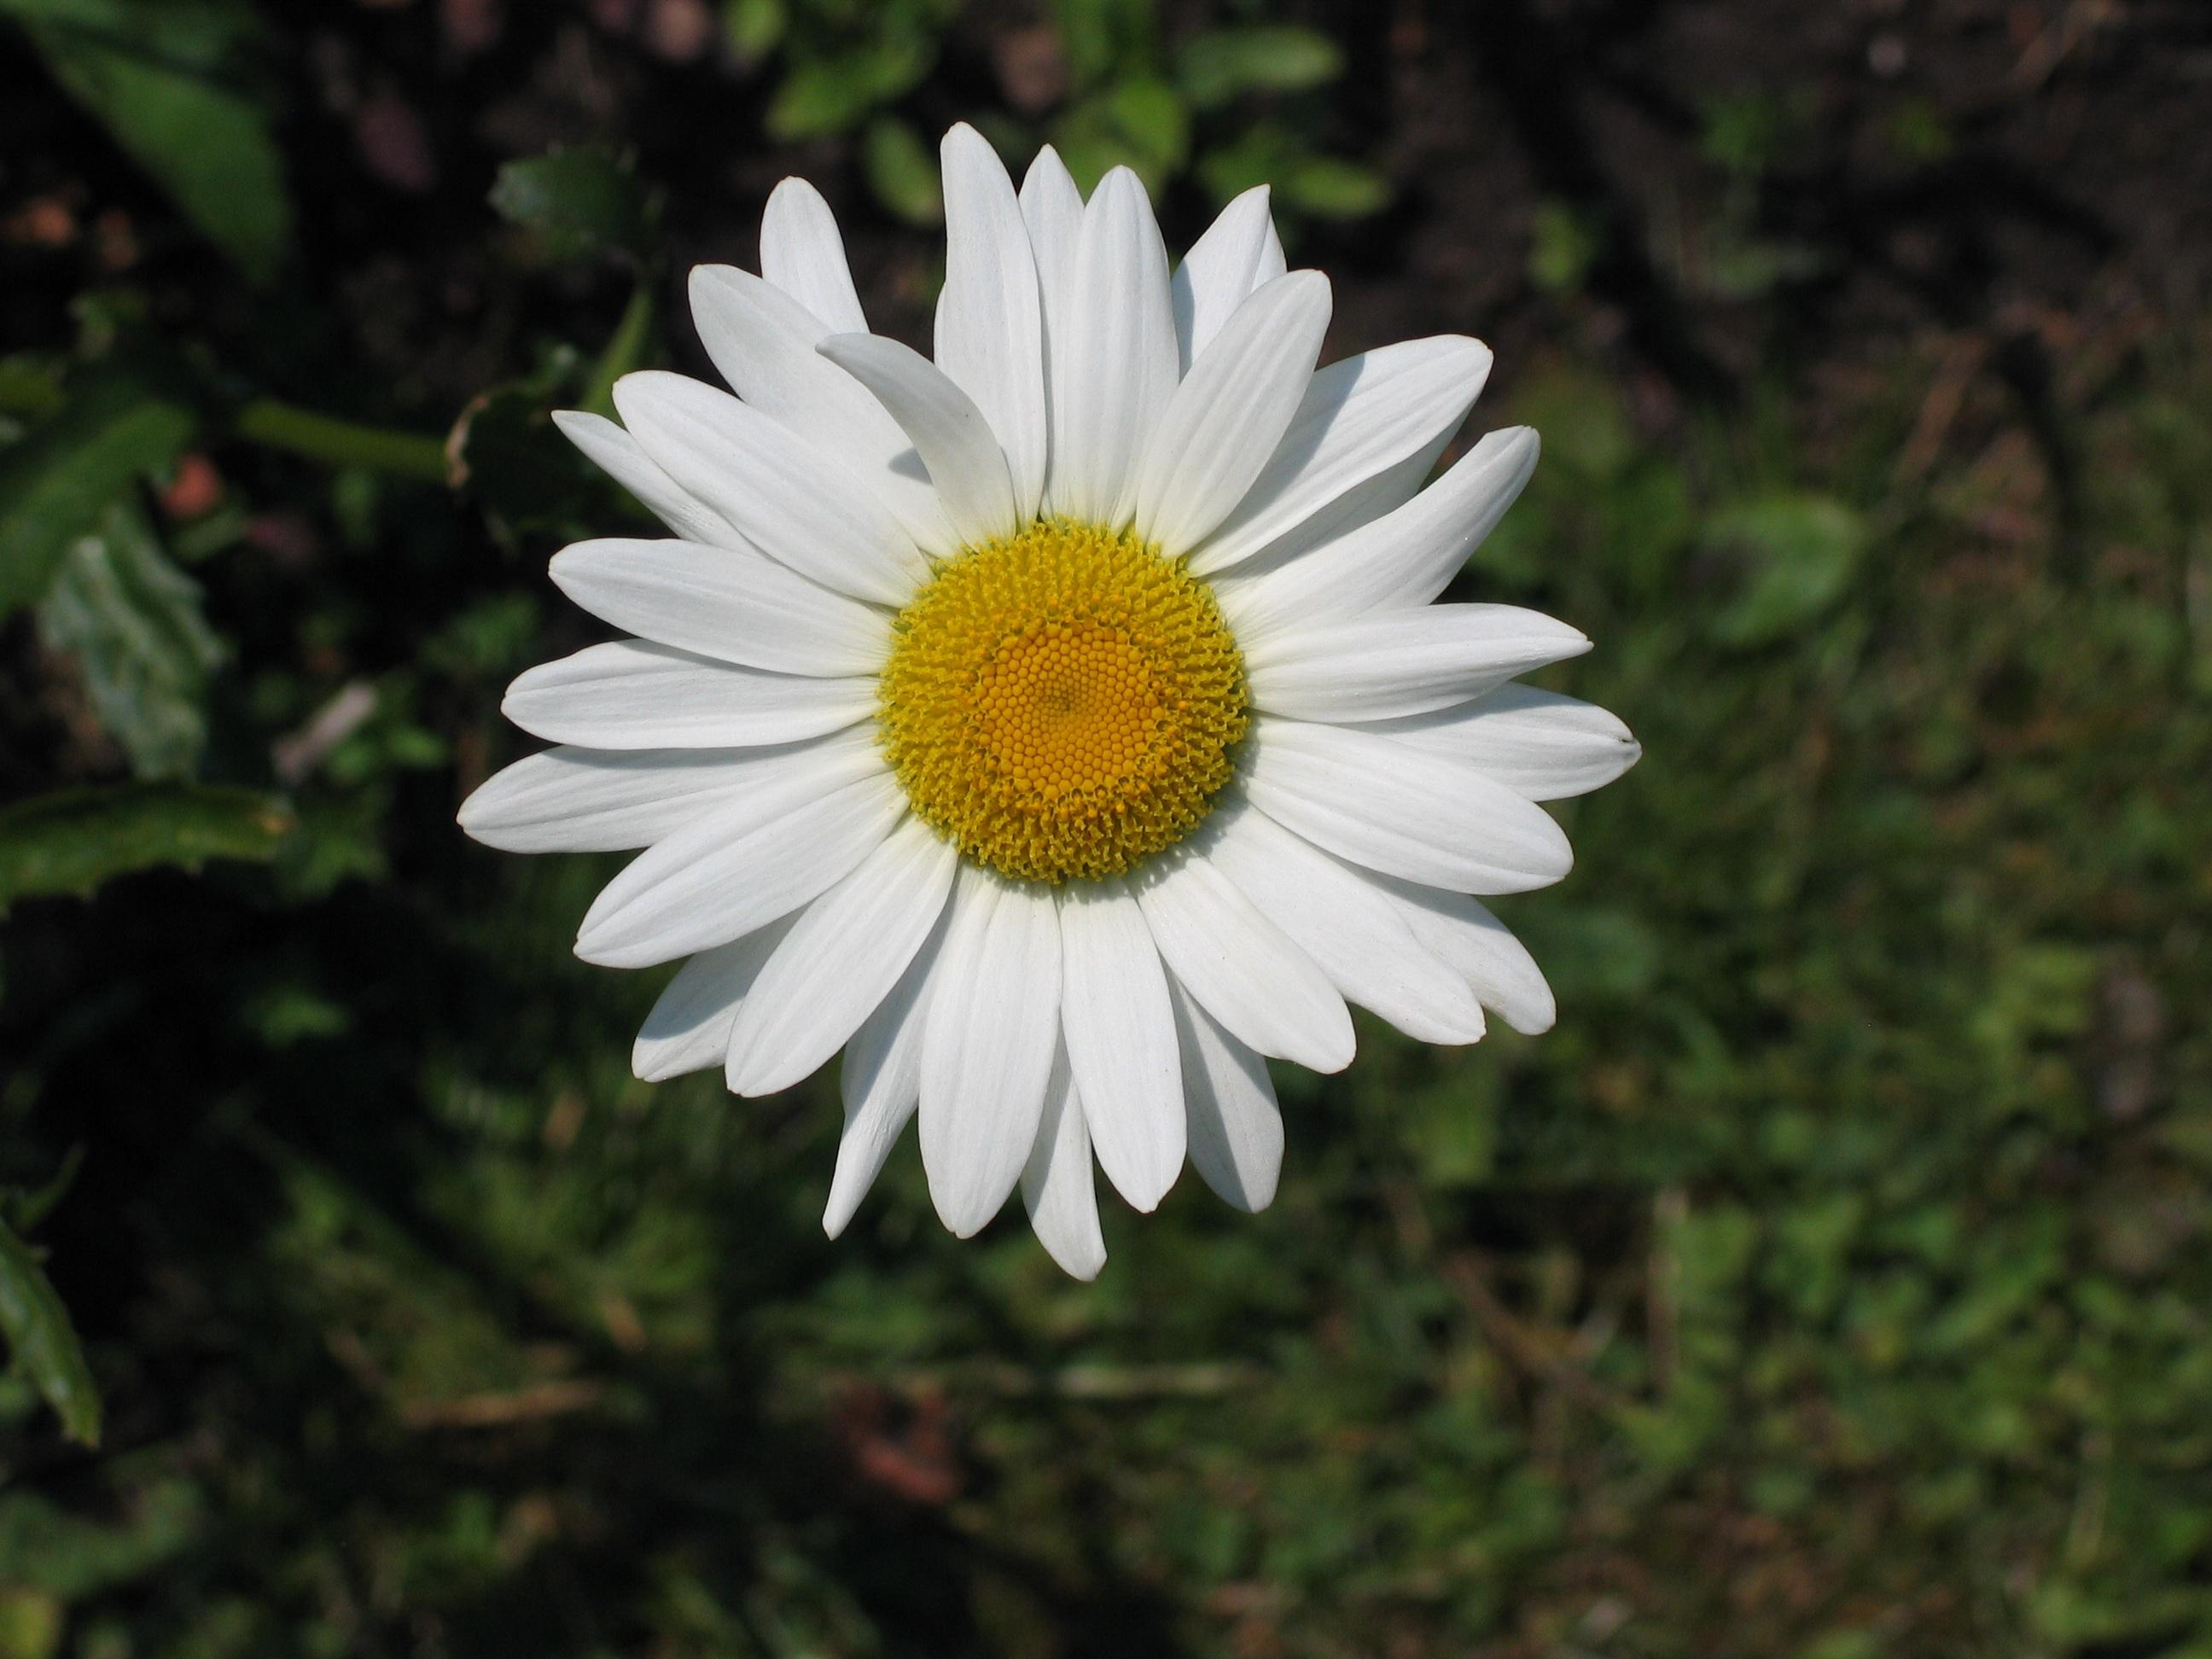 free images nature flower petal botany flora wildflower